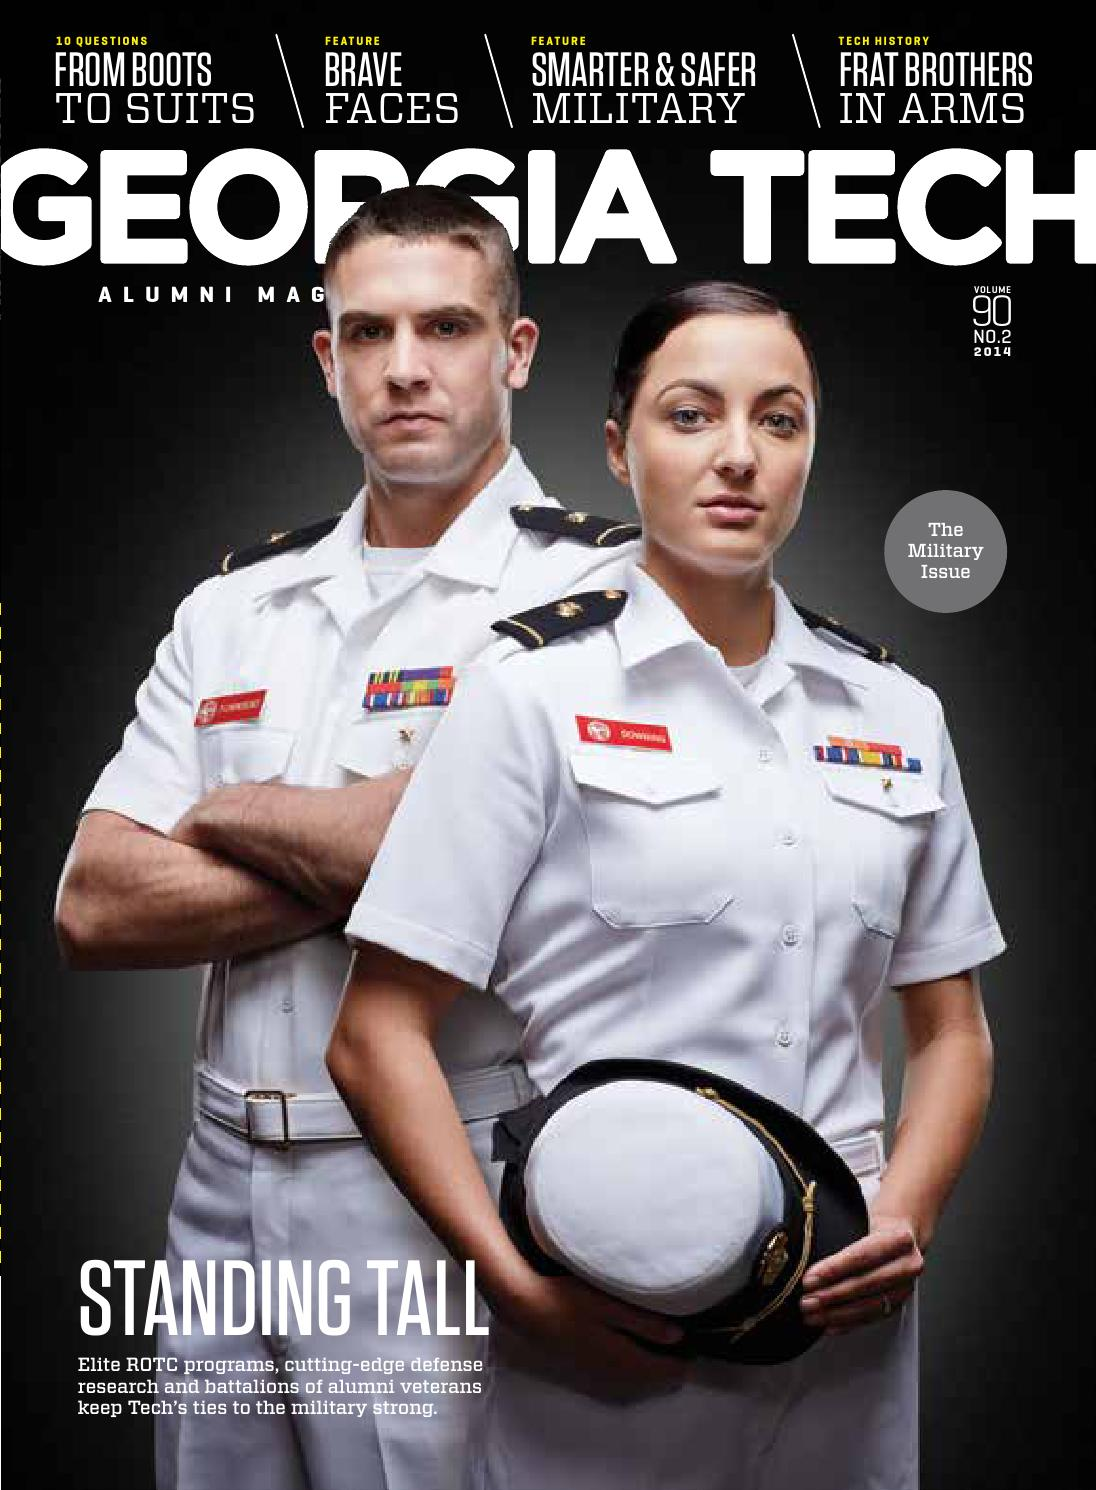 georgia tech admissions essay